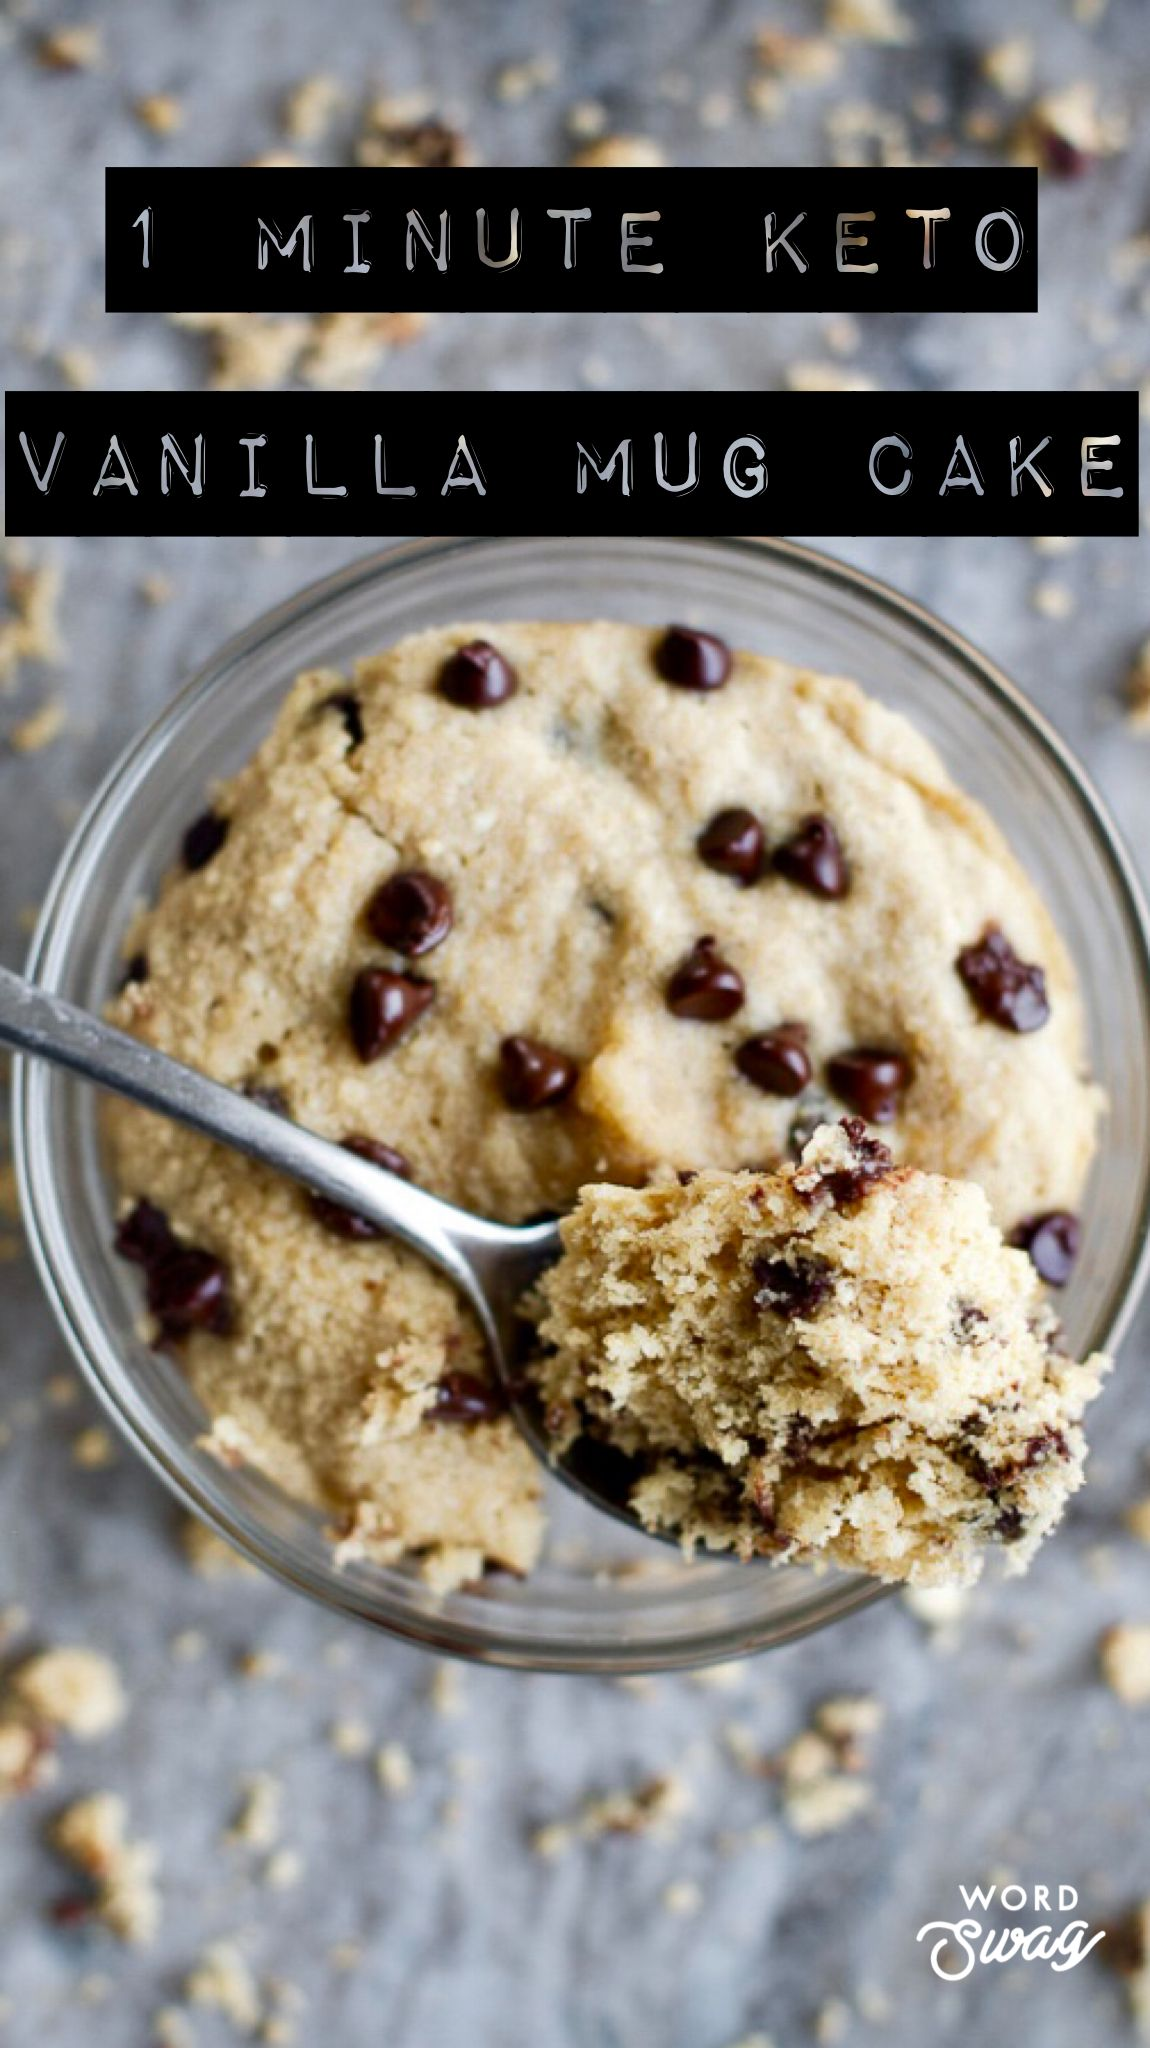 Healthy 1 Minute Keto Vanilla Mug Cake | Recipe | Protein ...